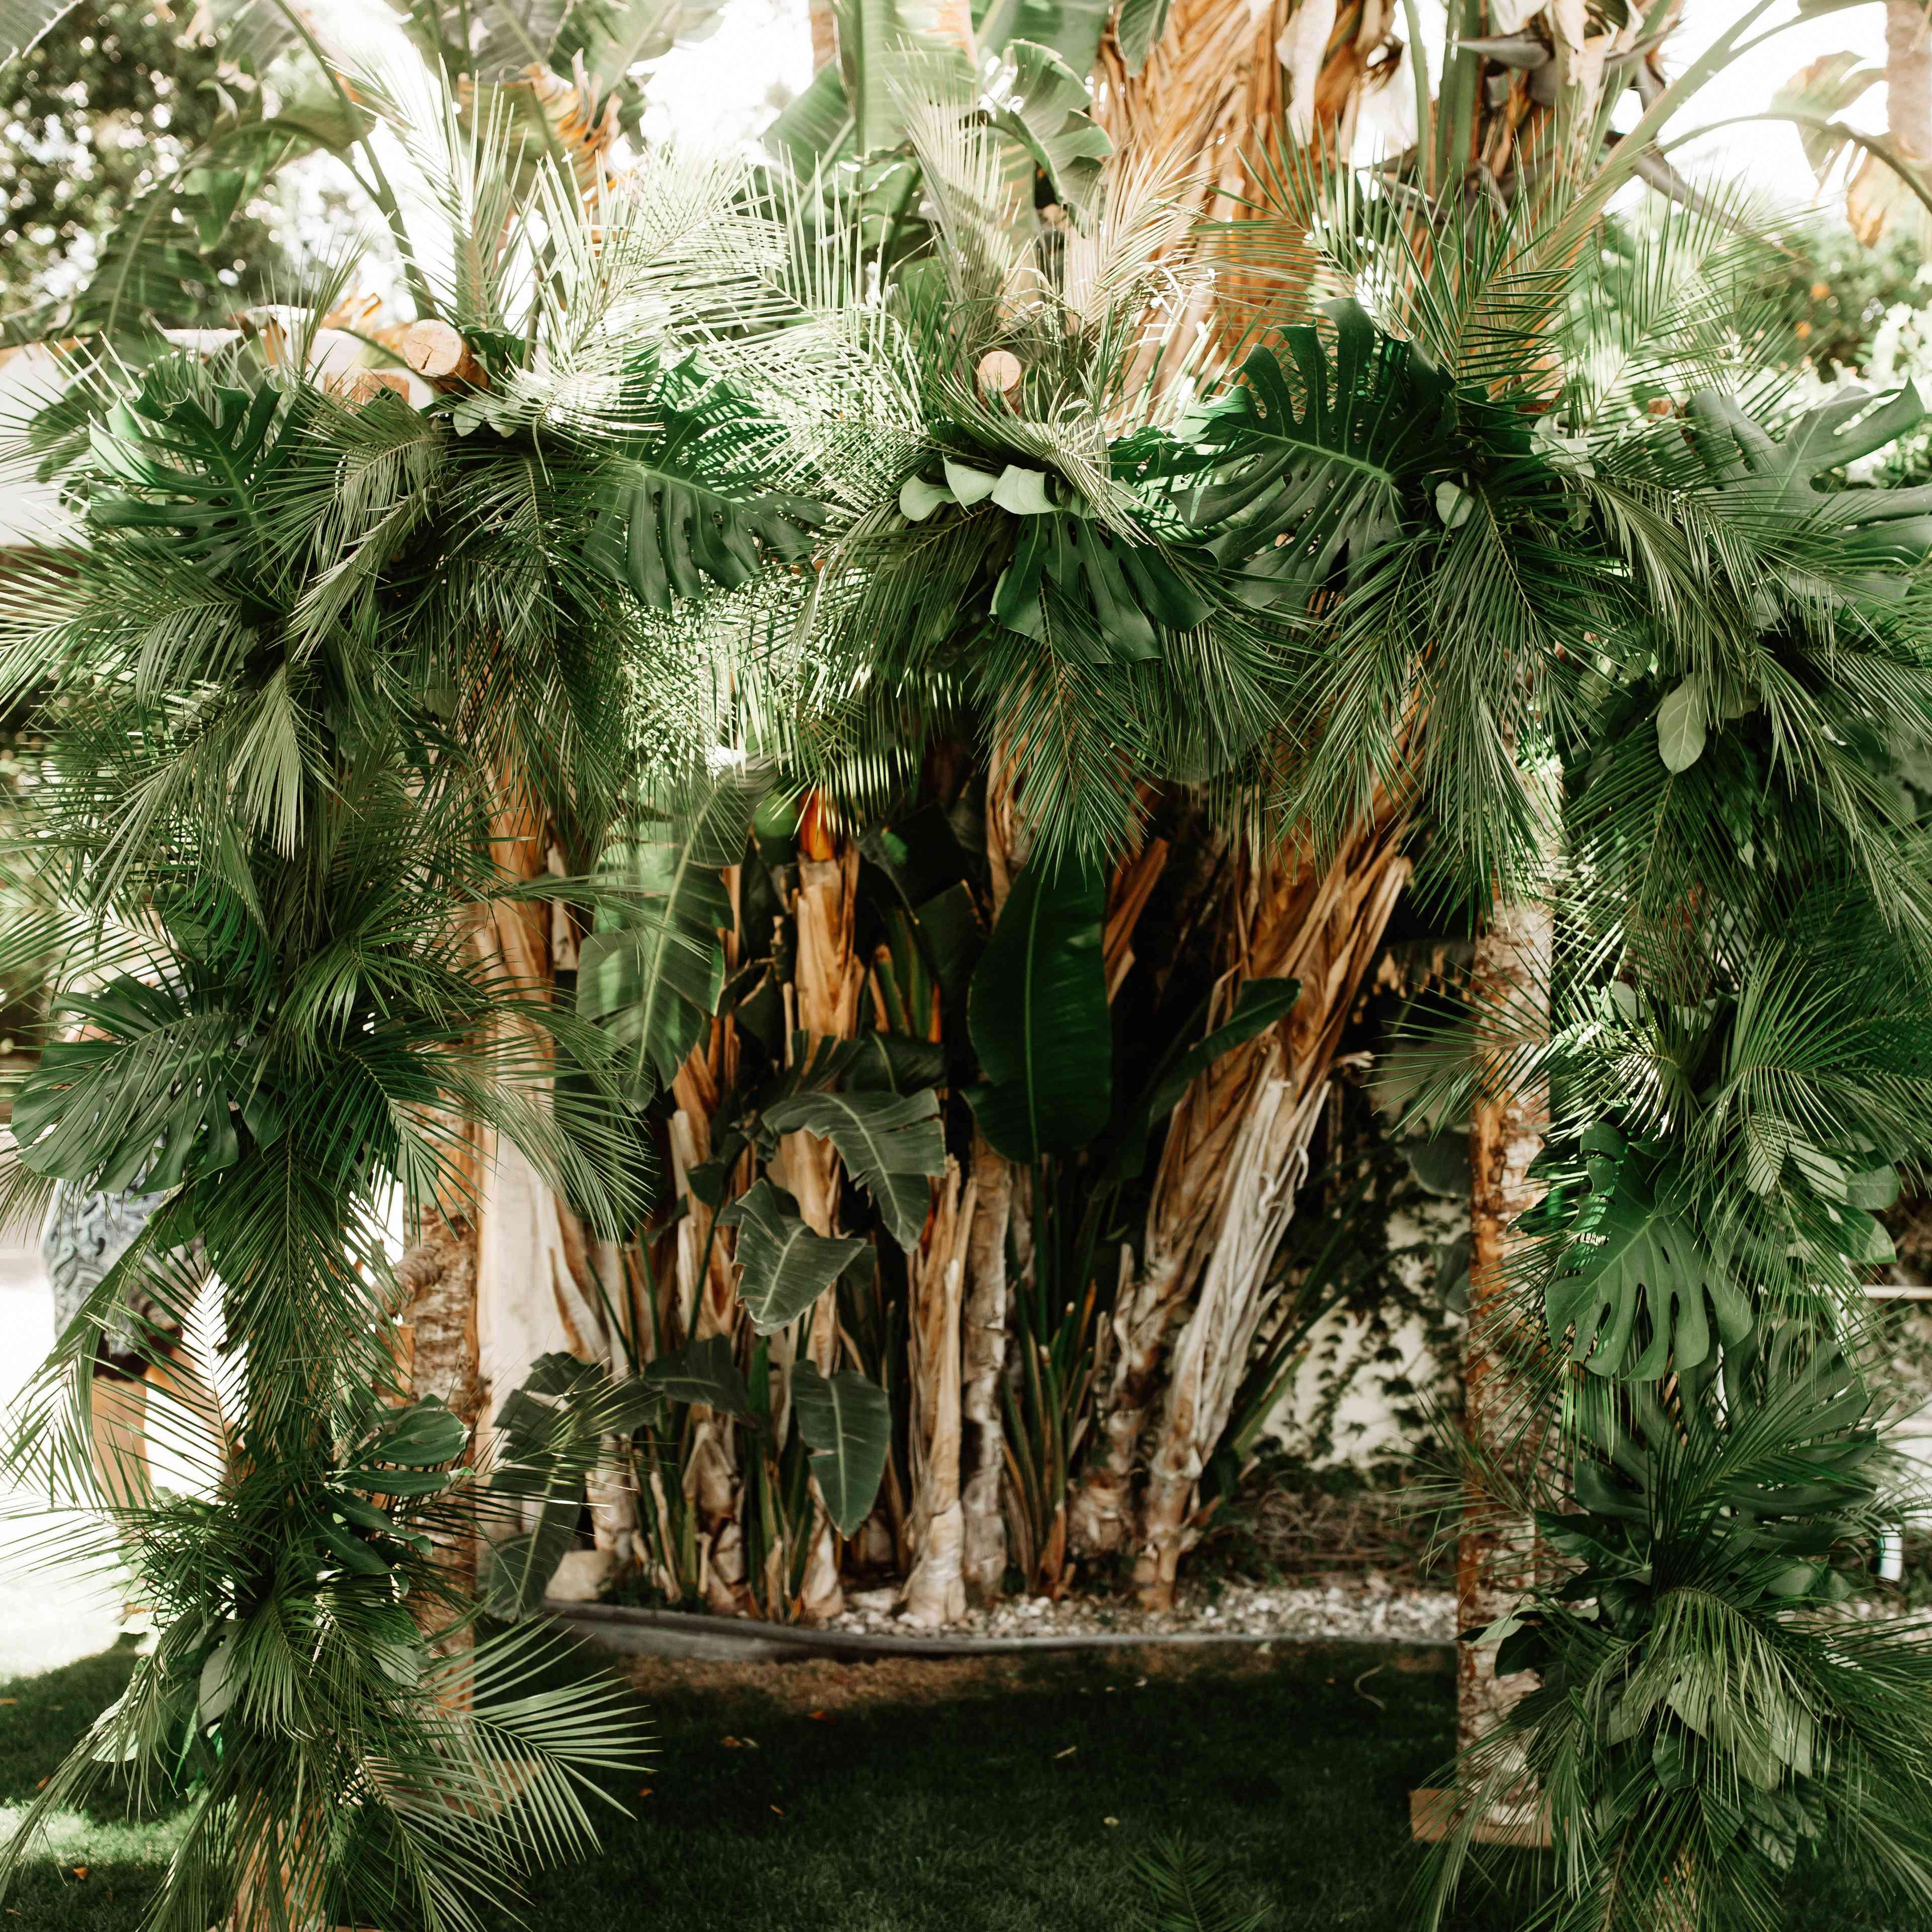 Tropical ceremony backdrop